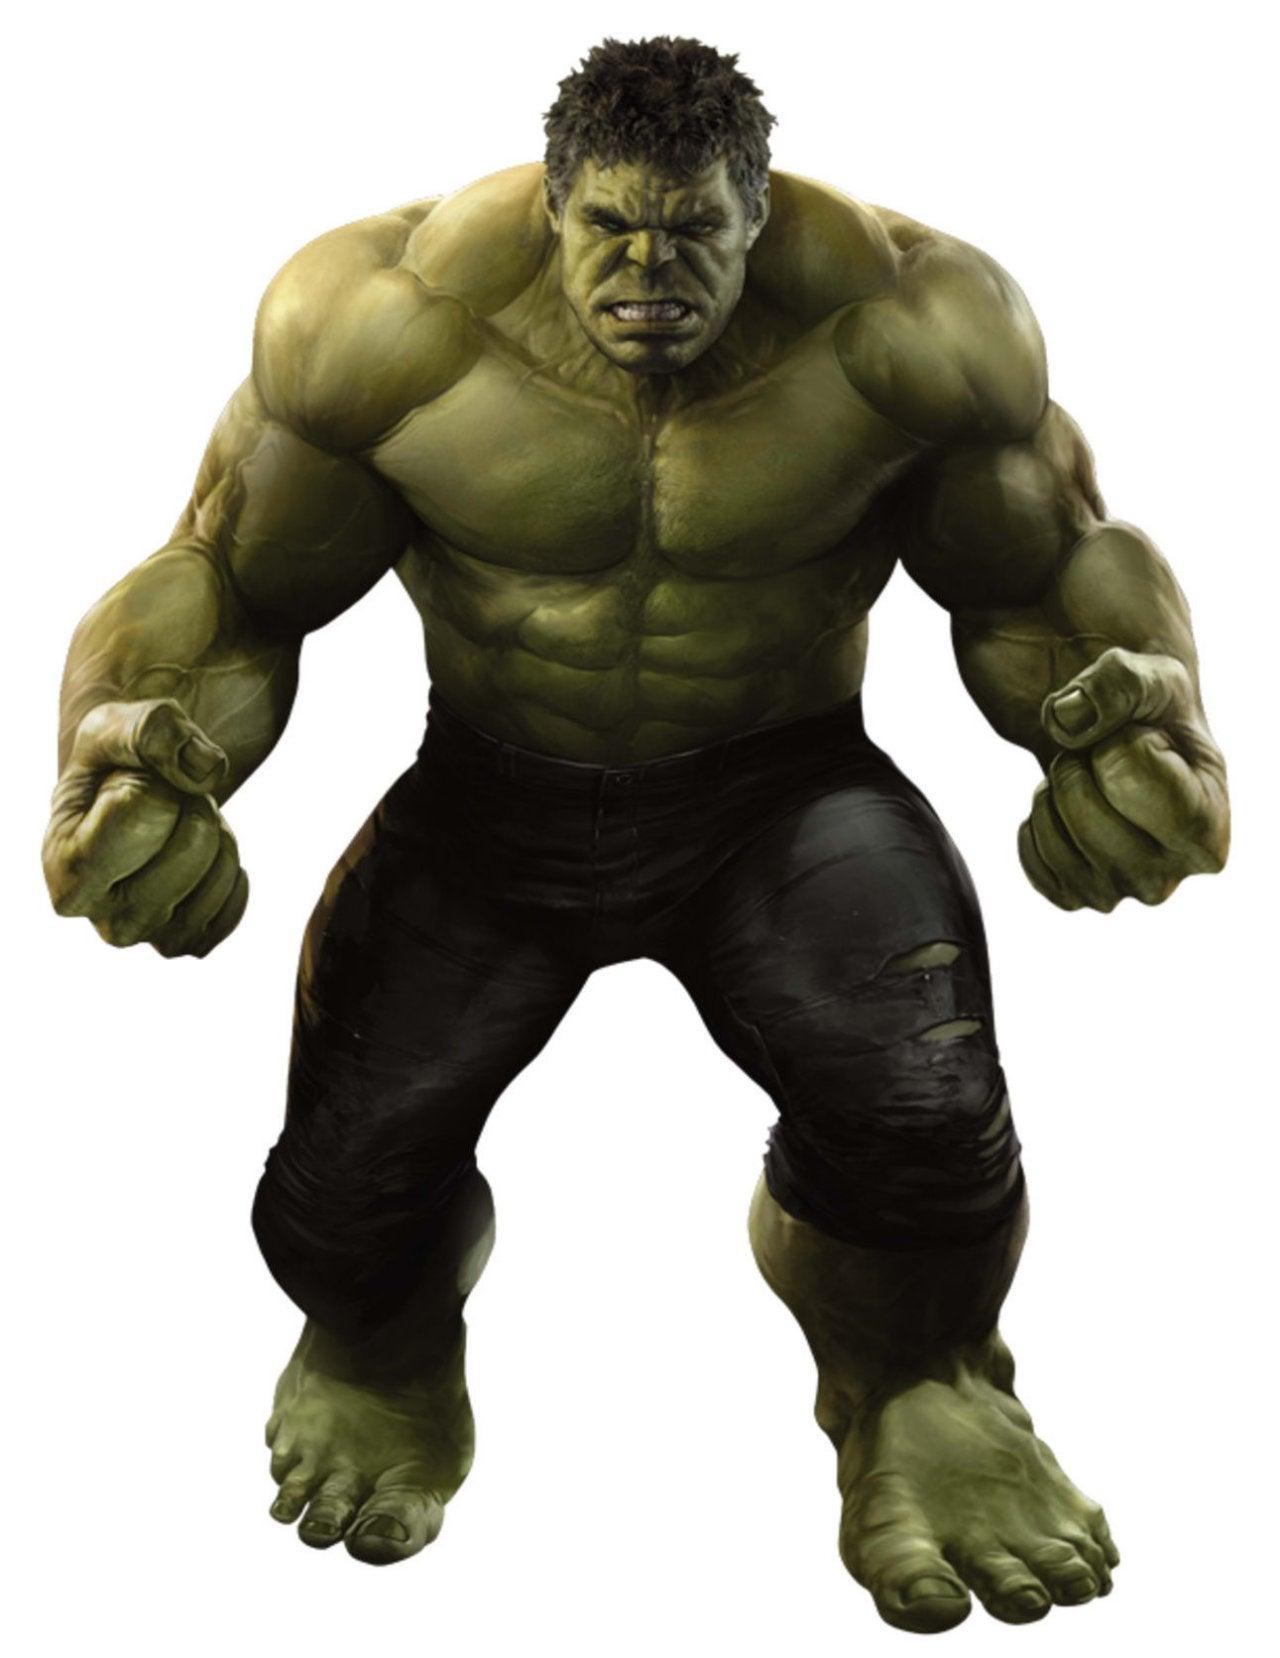 Avengers Infinity War Promo Art - Hulk